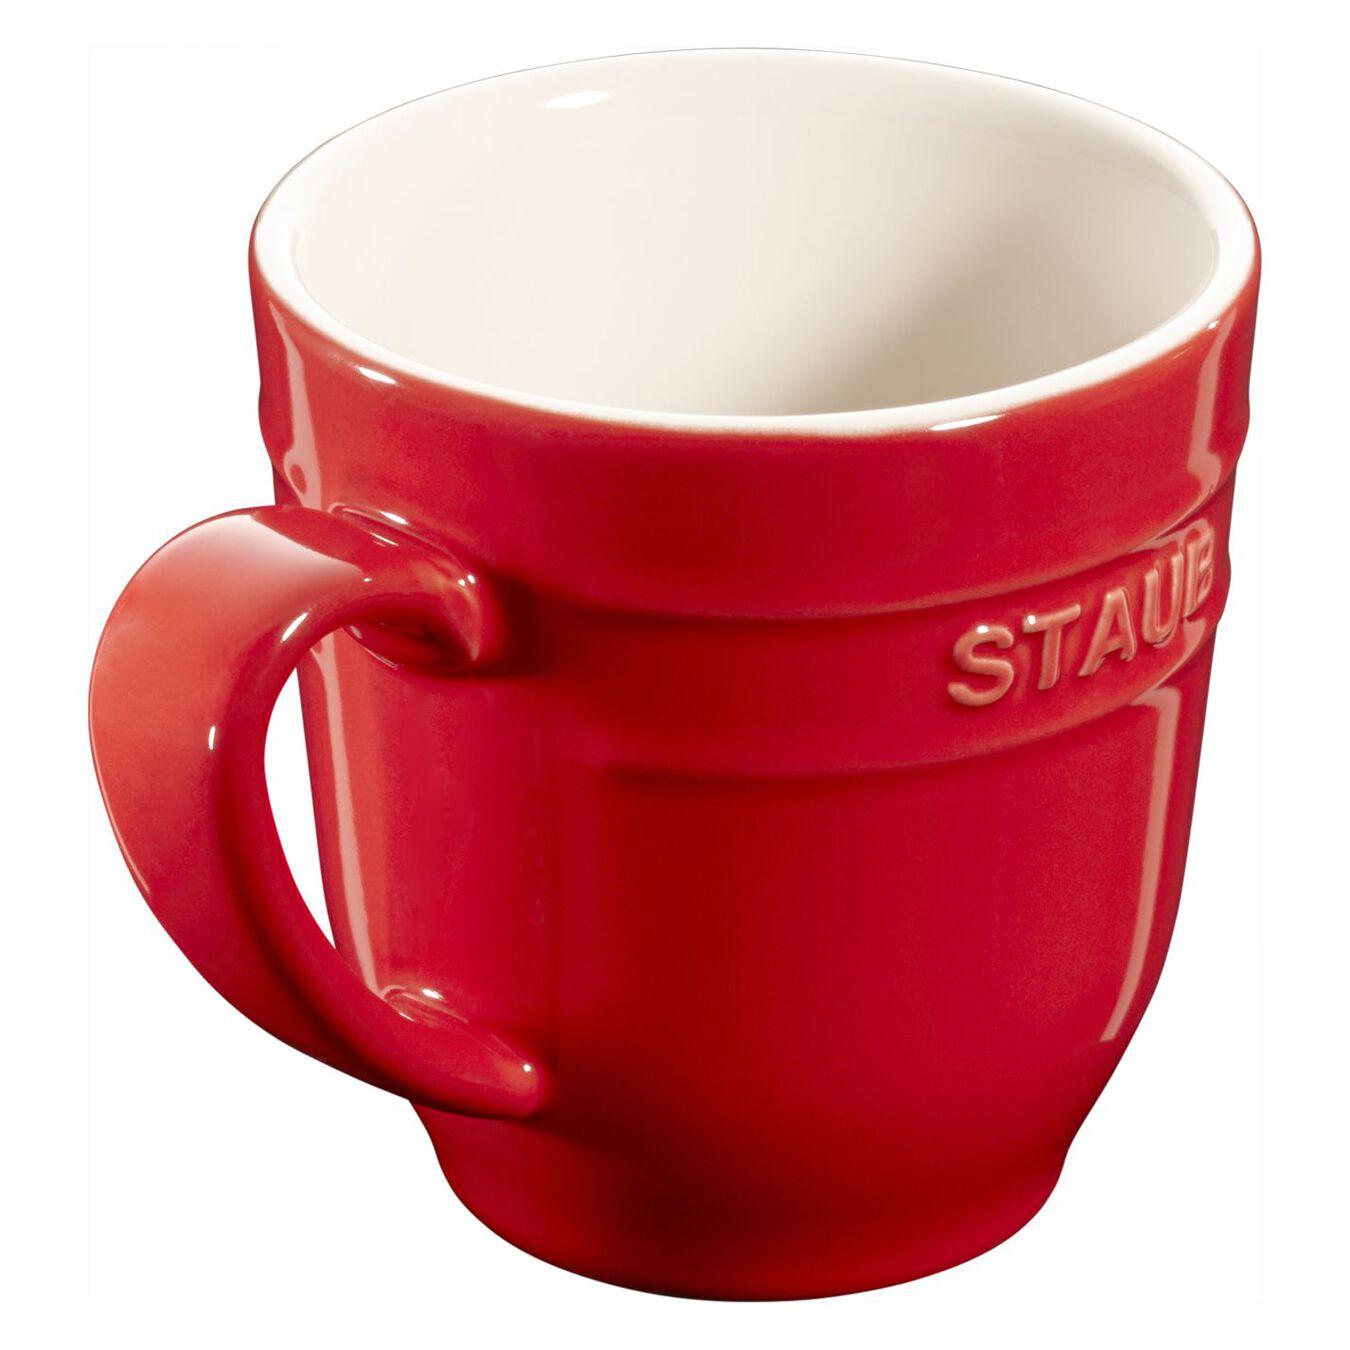 Tasse 350 ml, Keramik,,large 2